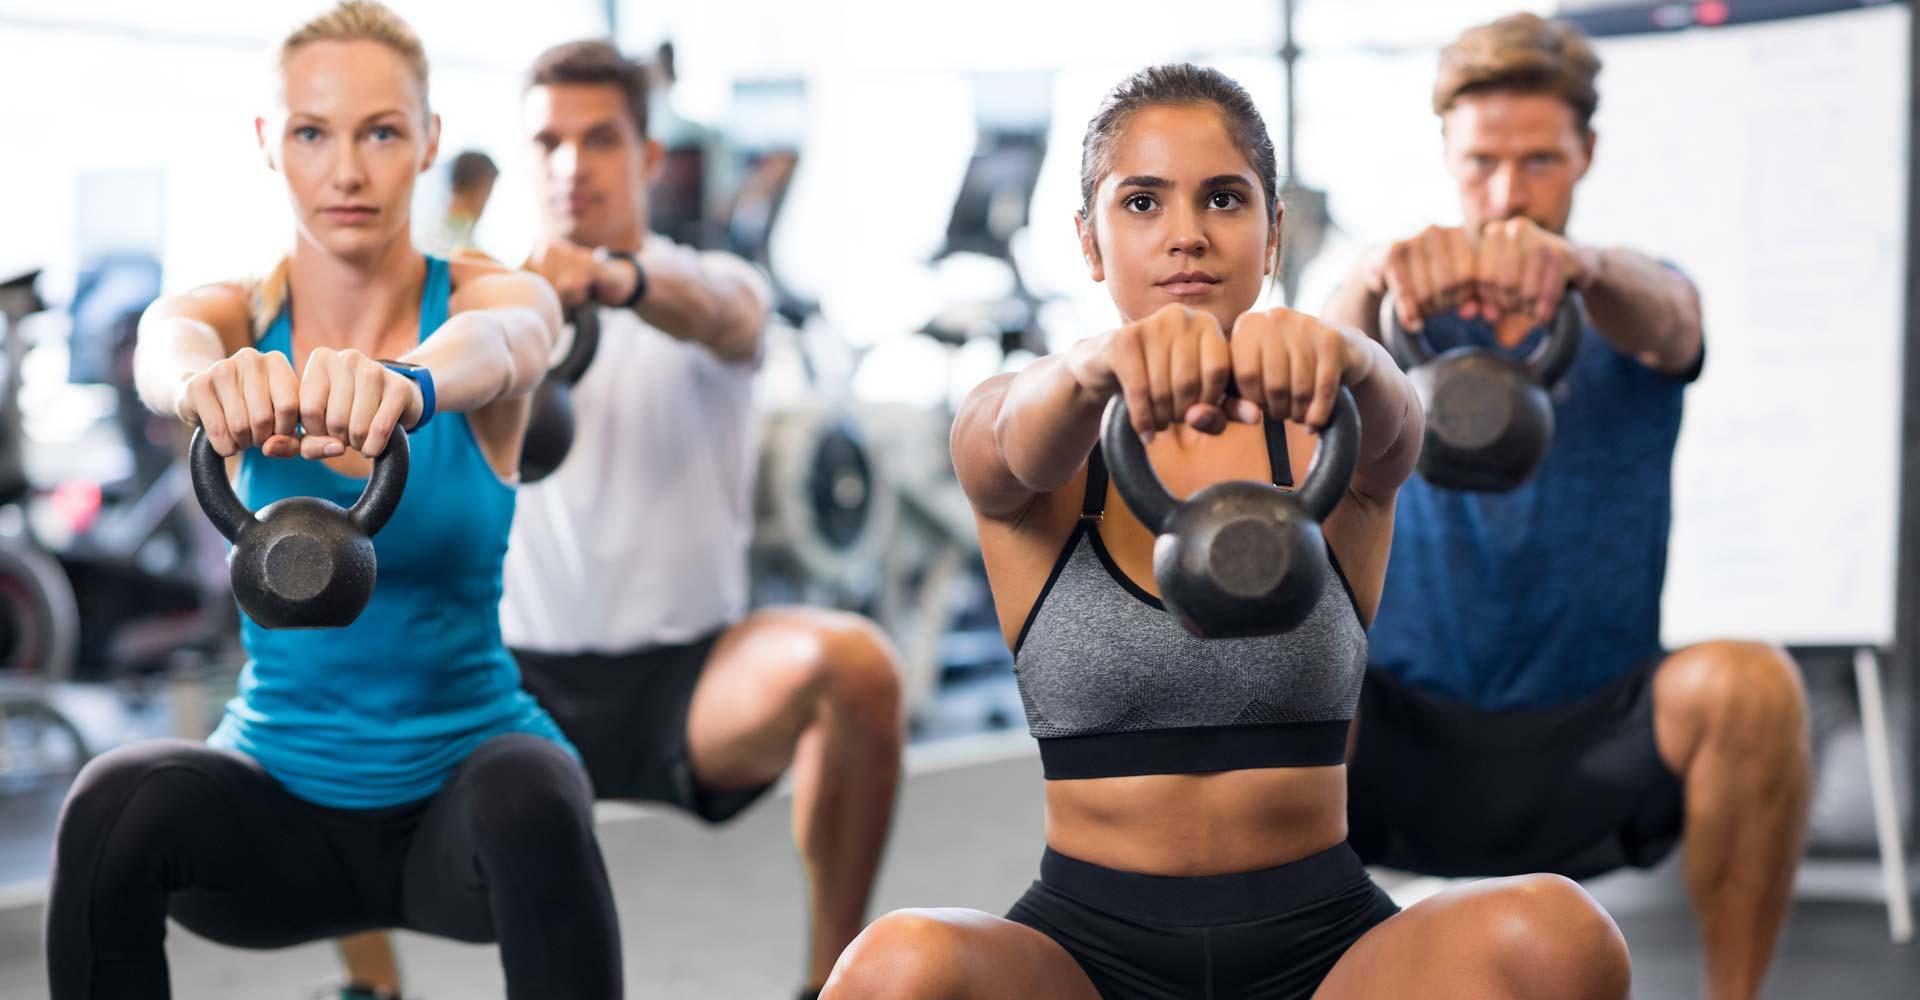 Kettle bell workout | Nutrition Assessment Clinic